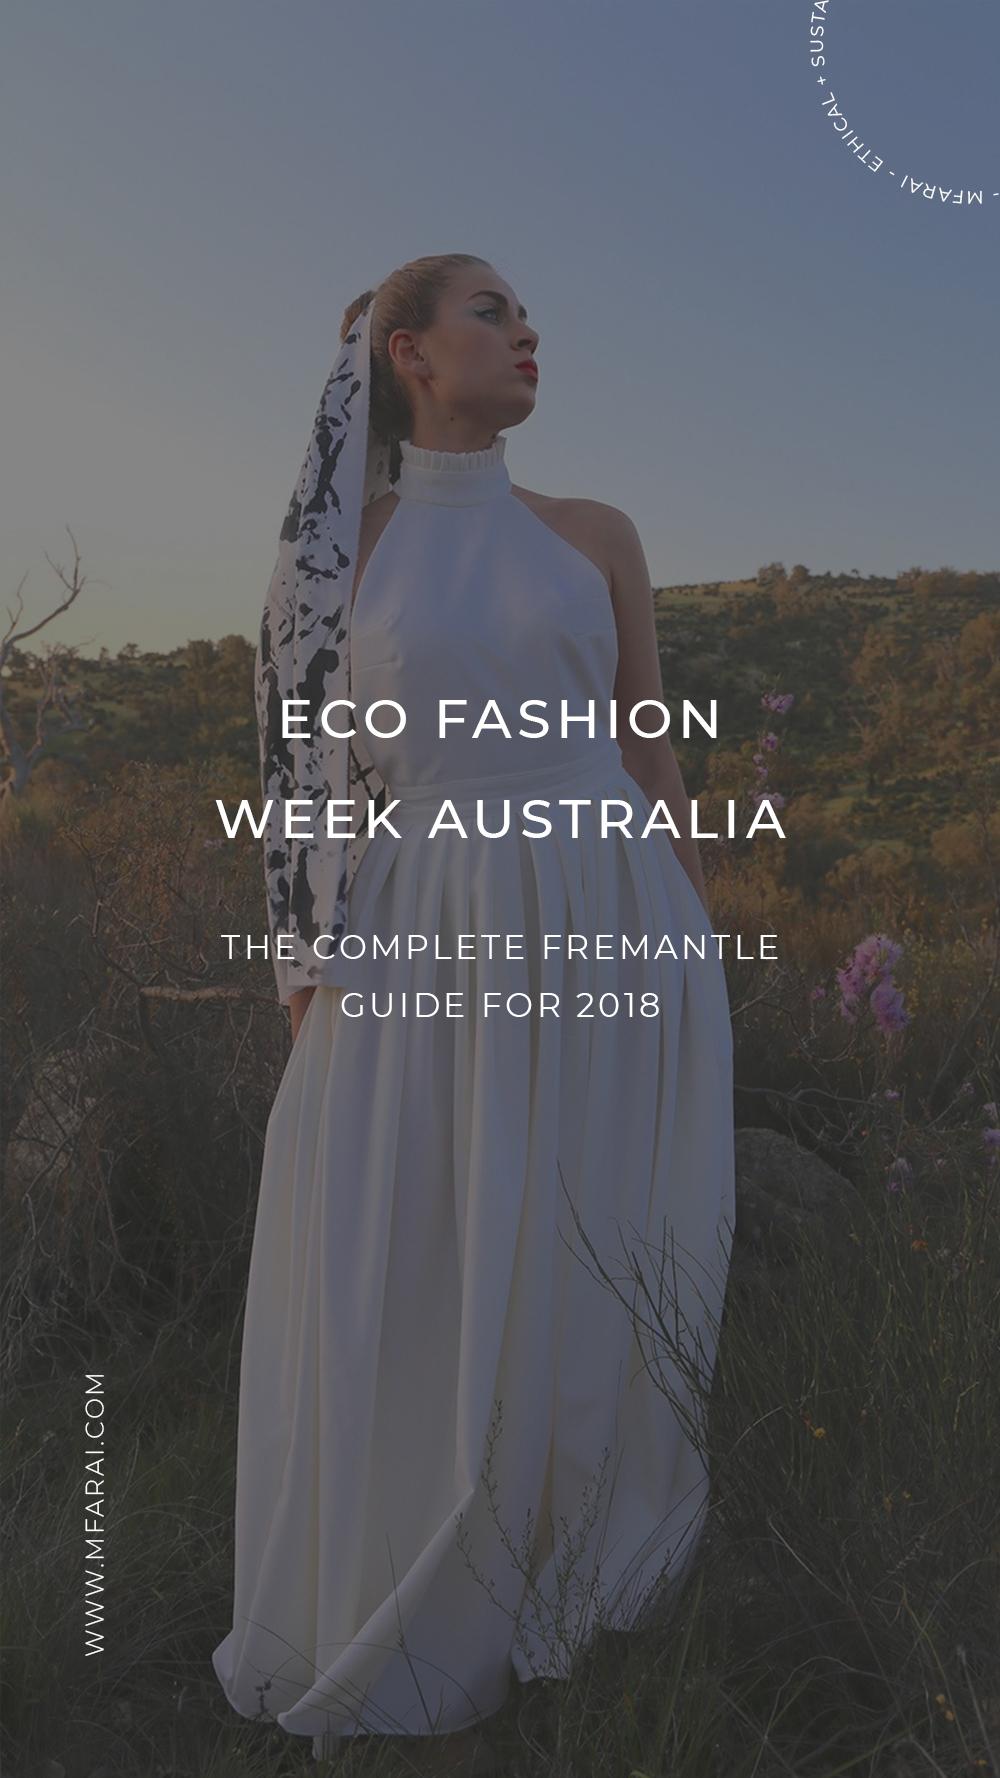 Eco Fashion Week Australia Fremantle Guide 2018